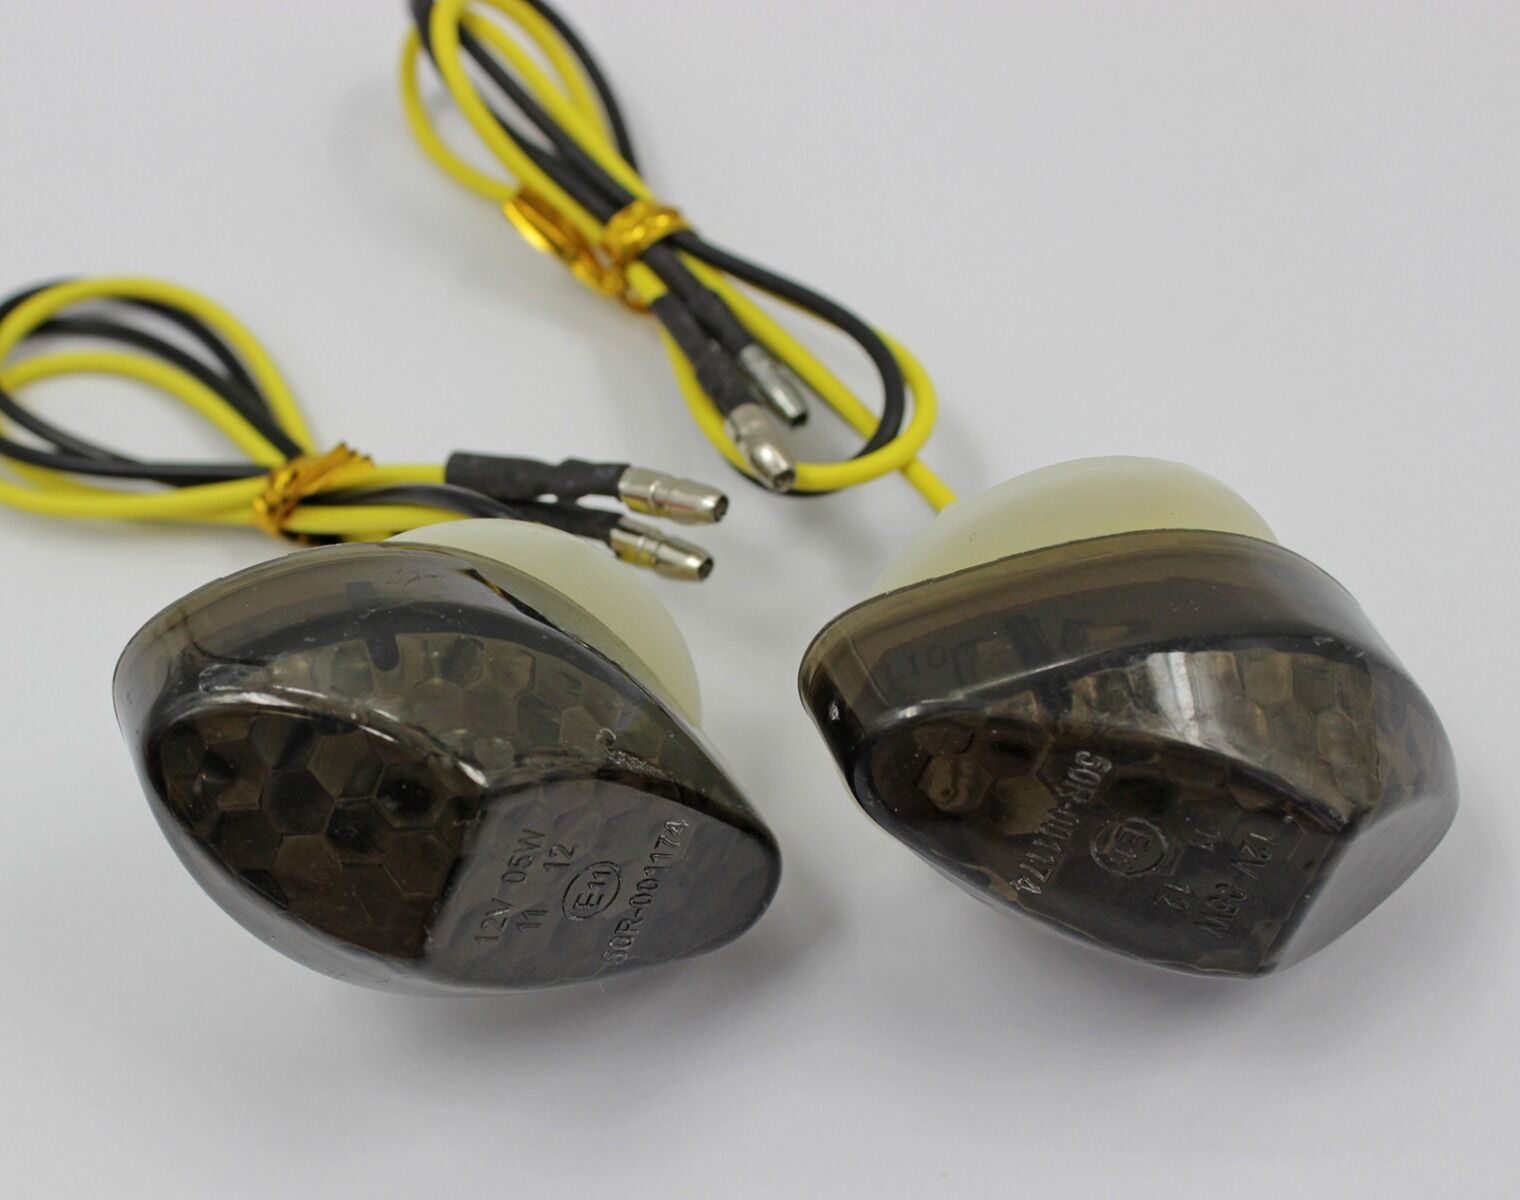 Suzuki LED Front Flush Mount Turn Signal Indicator Blinker Light  12 Volt  Smoke